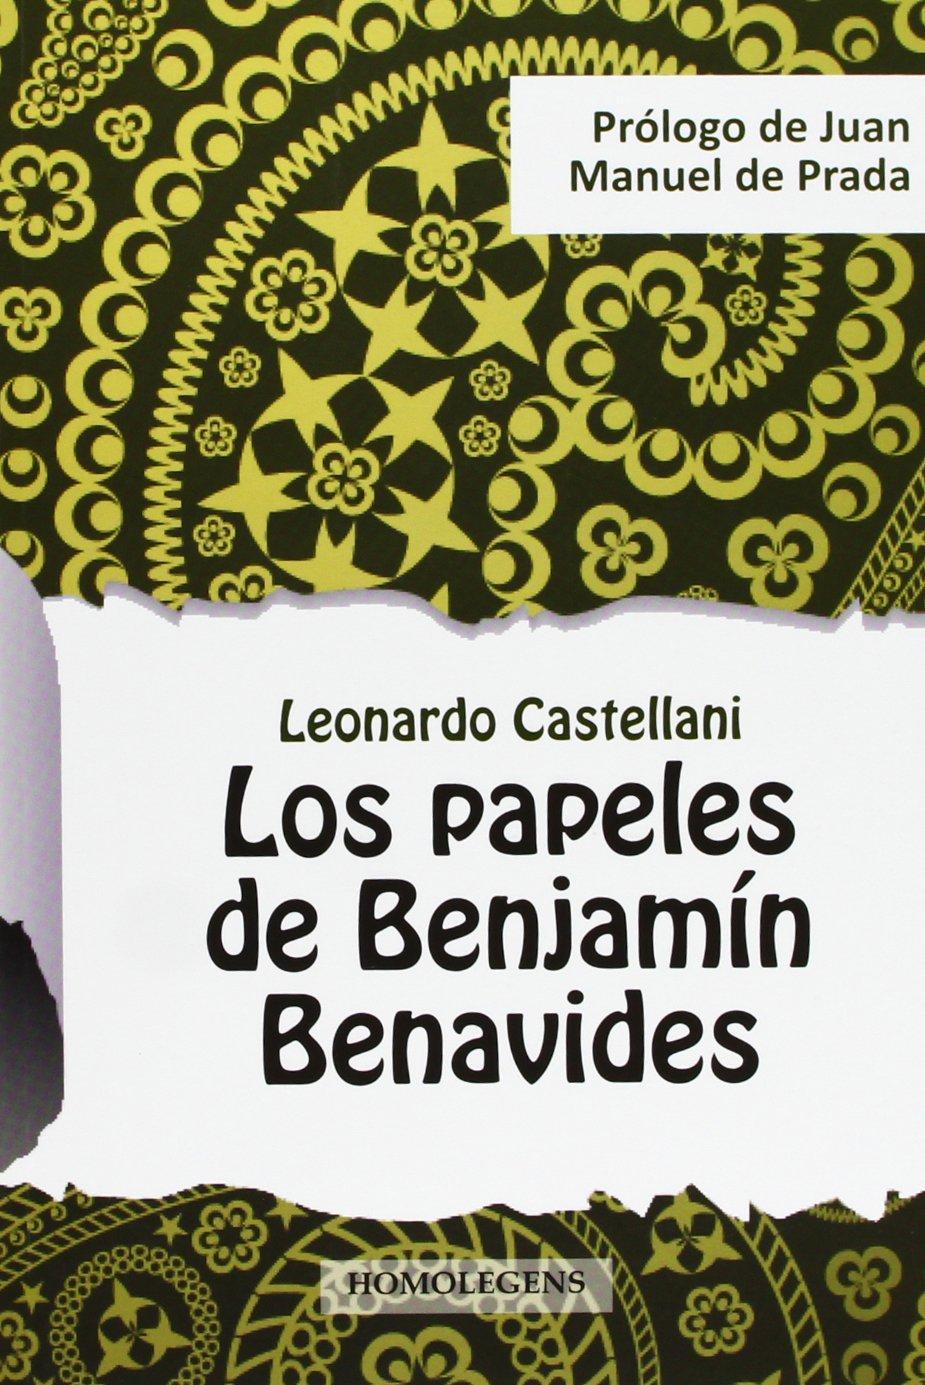 Papeles De Benjamin Benavides, Los (Narrativa (homo Legens)) Tapa blanda – 7 nov 2012 Leonardo Castellani S.L. 8492518618 EDUCATION / General